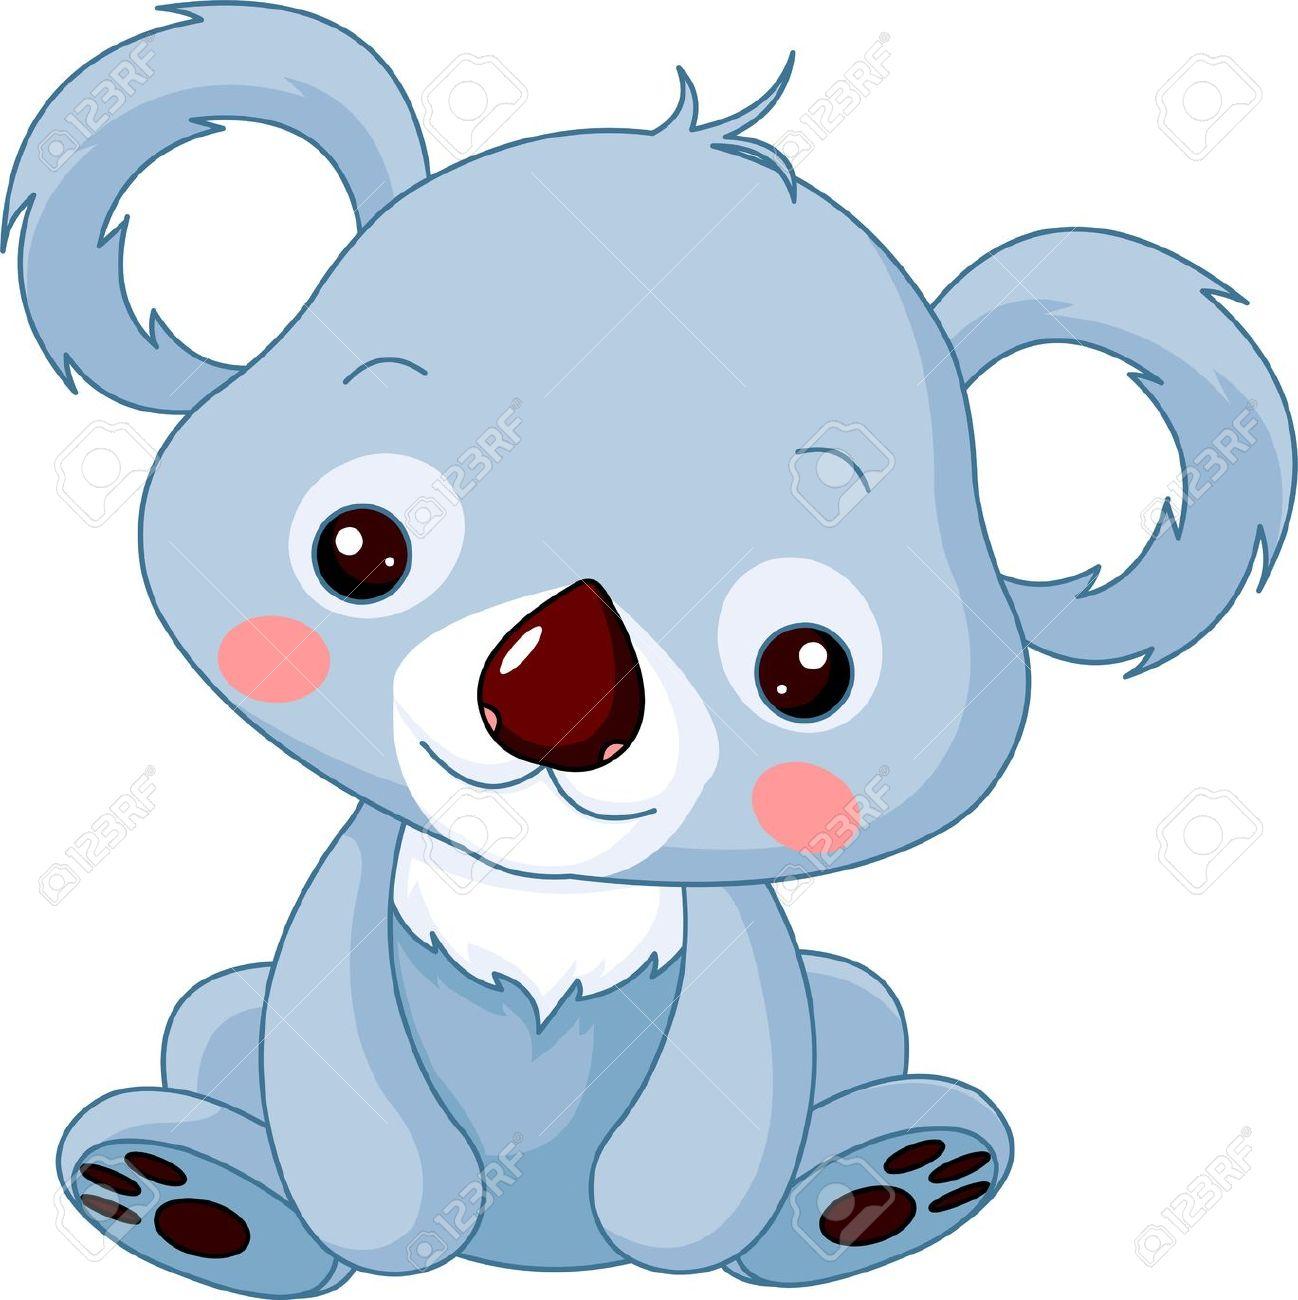 1298x1300 Baby Koala Drawings